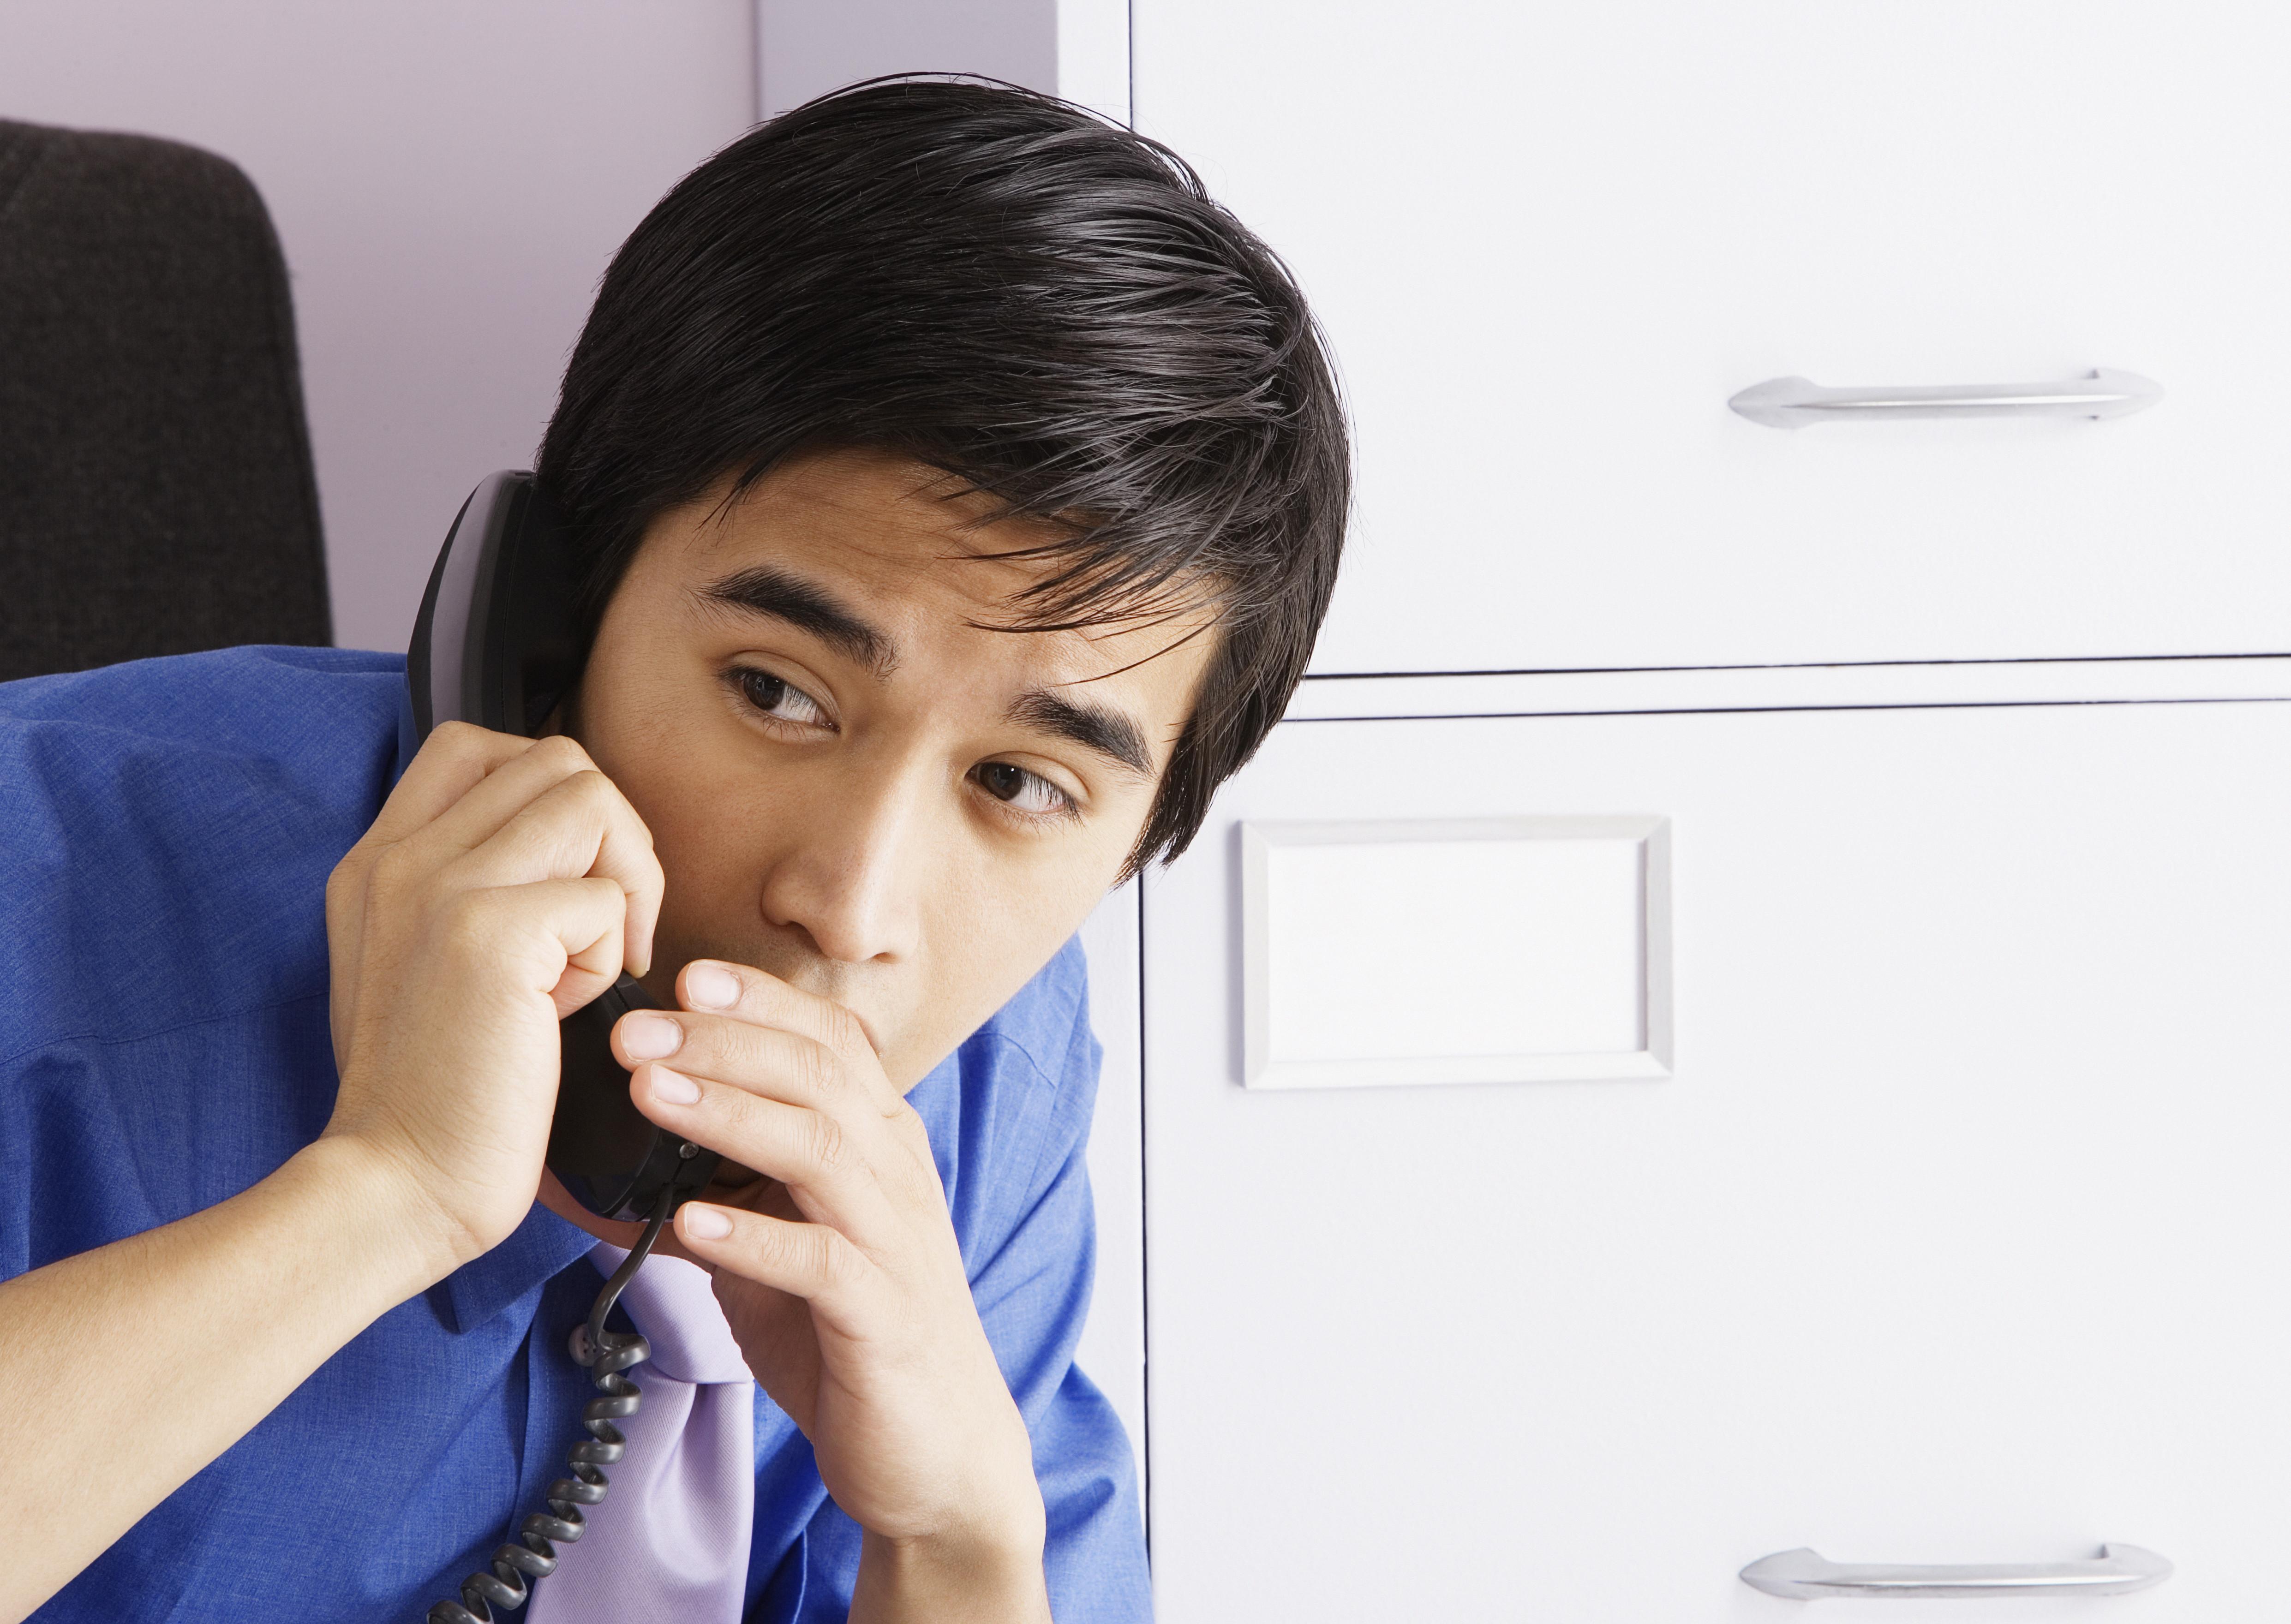 secret phone call